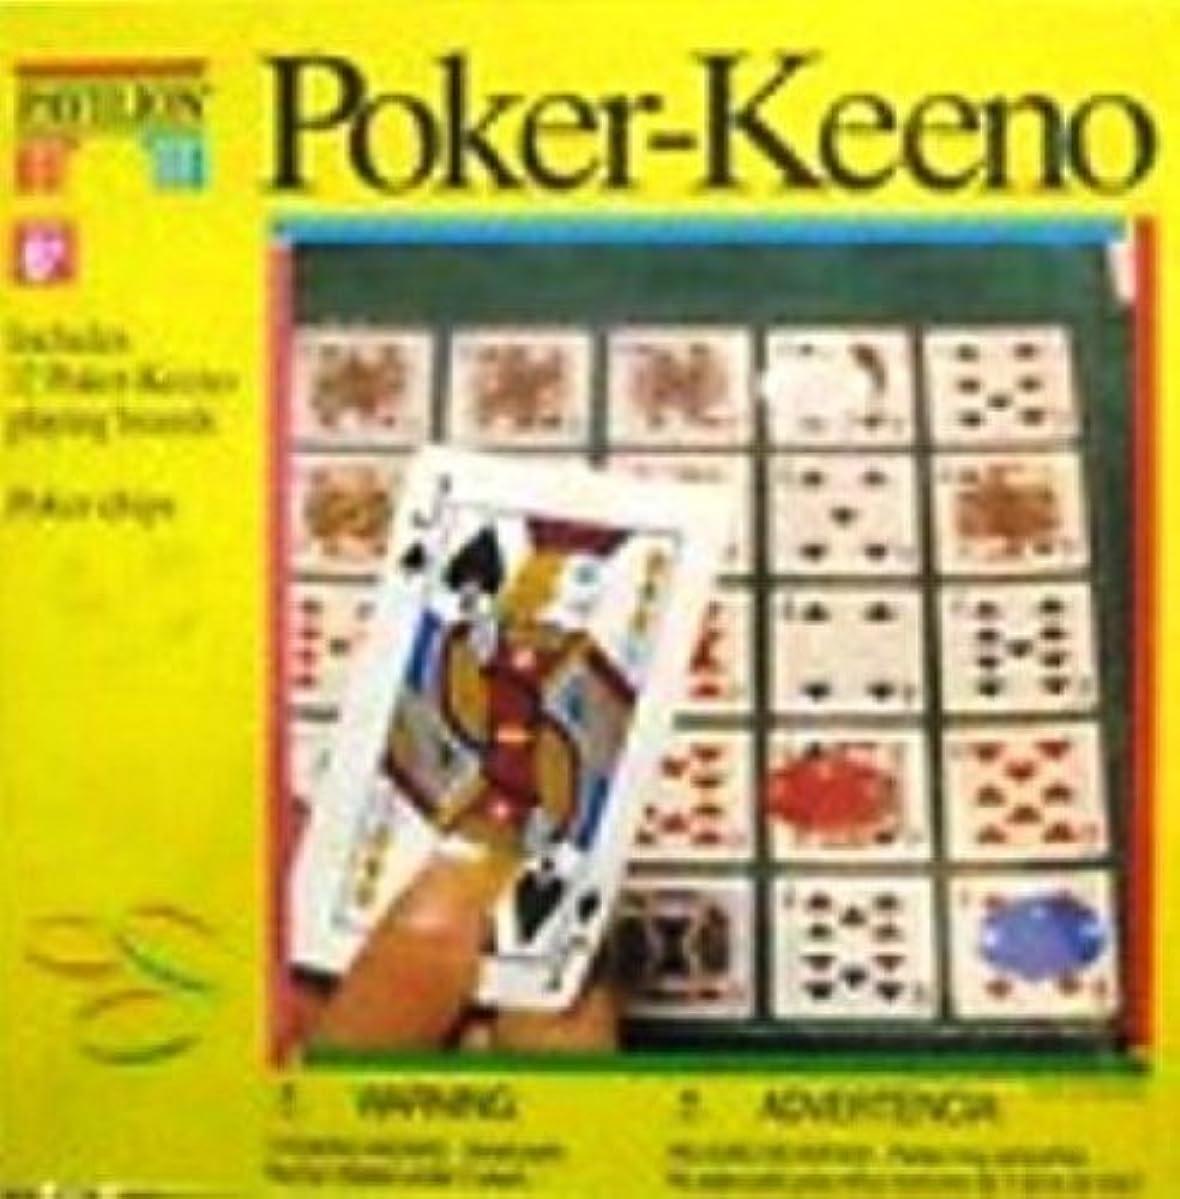 Poker-keeno (Item #99)